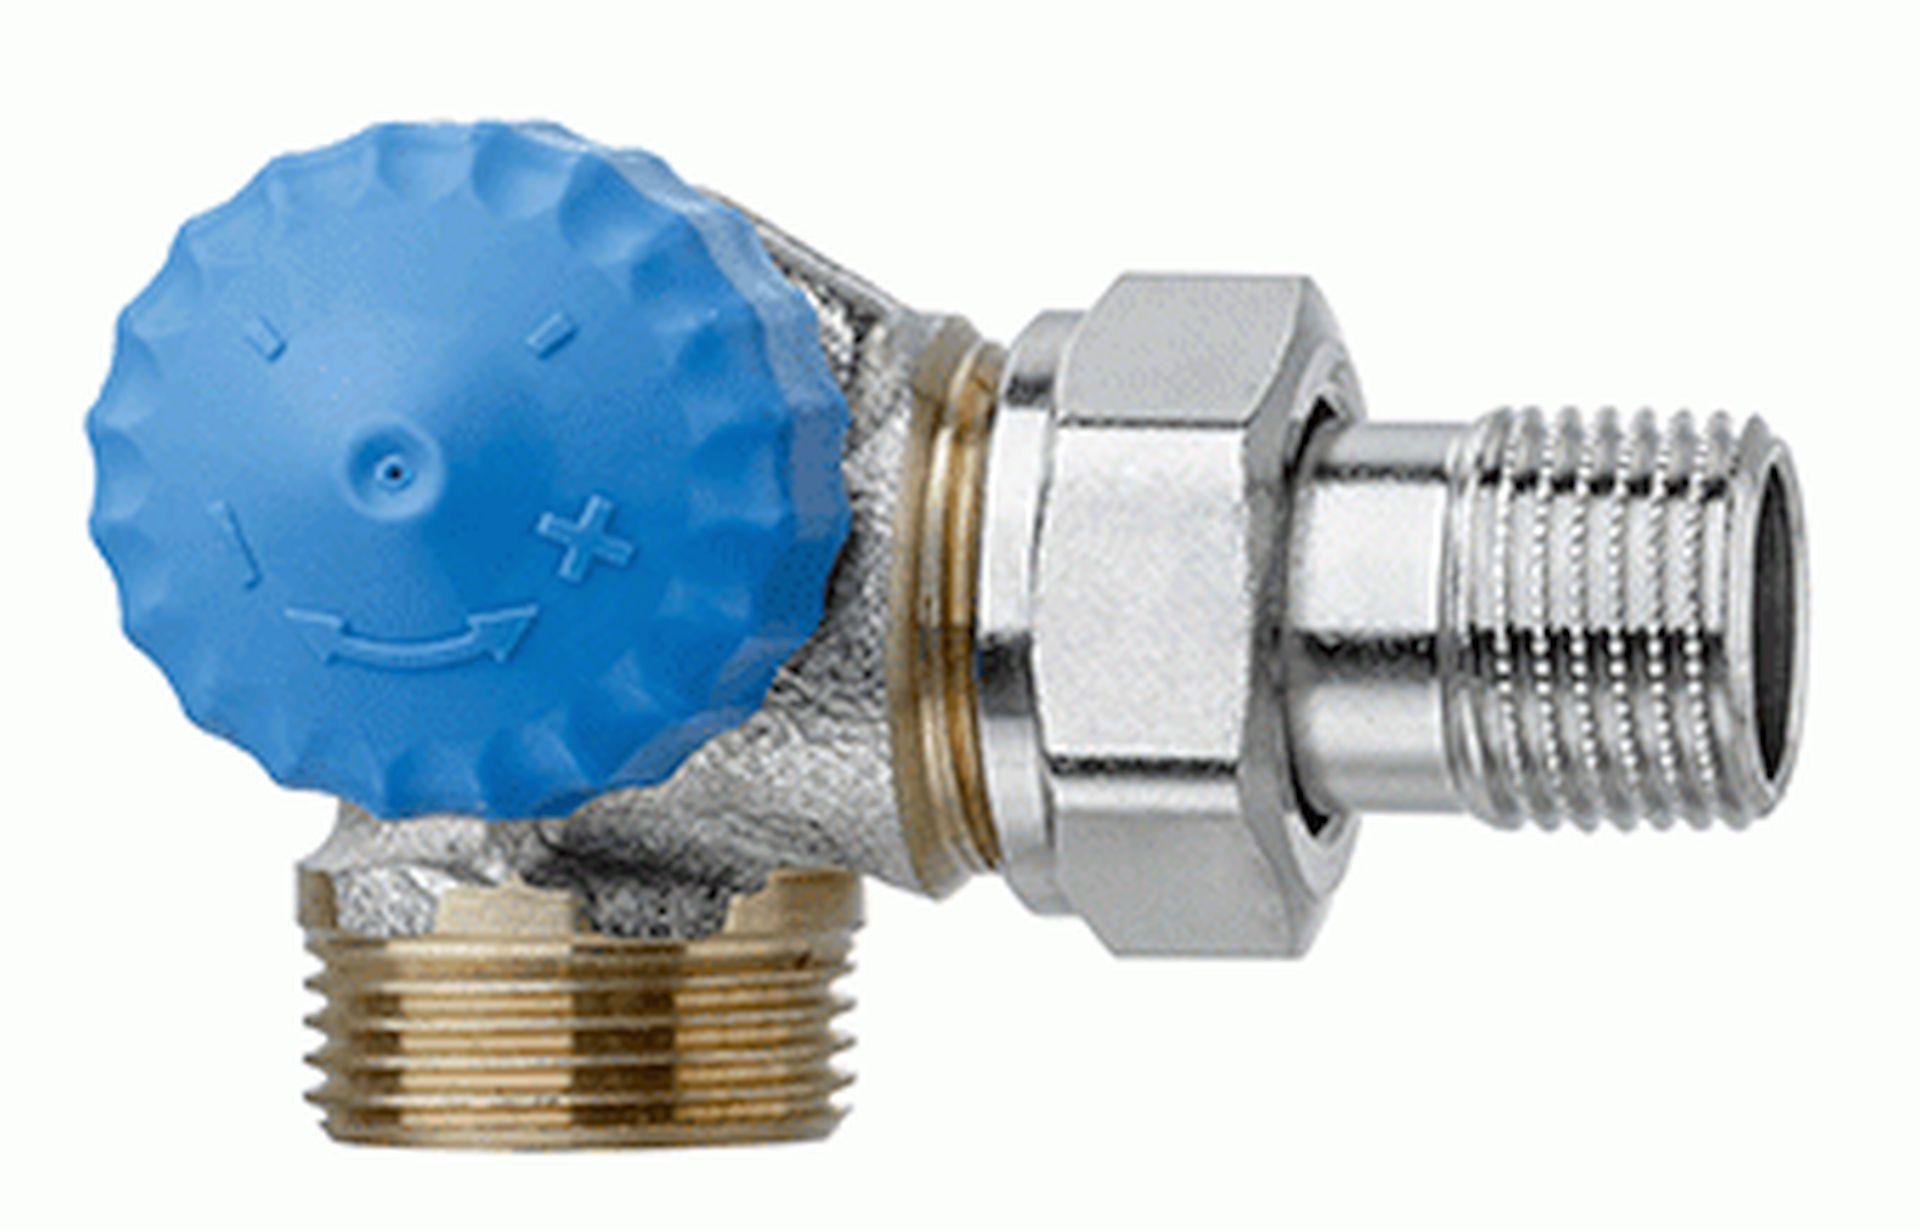 "HEIMEIER radiátorový ventil samotížný DN 15-3/4"" úhlový, levý, vnější závit 2343-02.000"